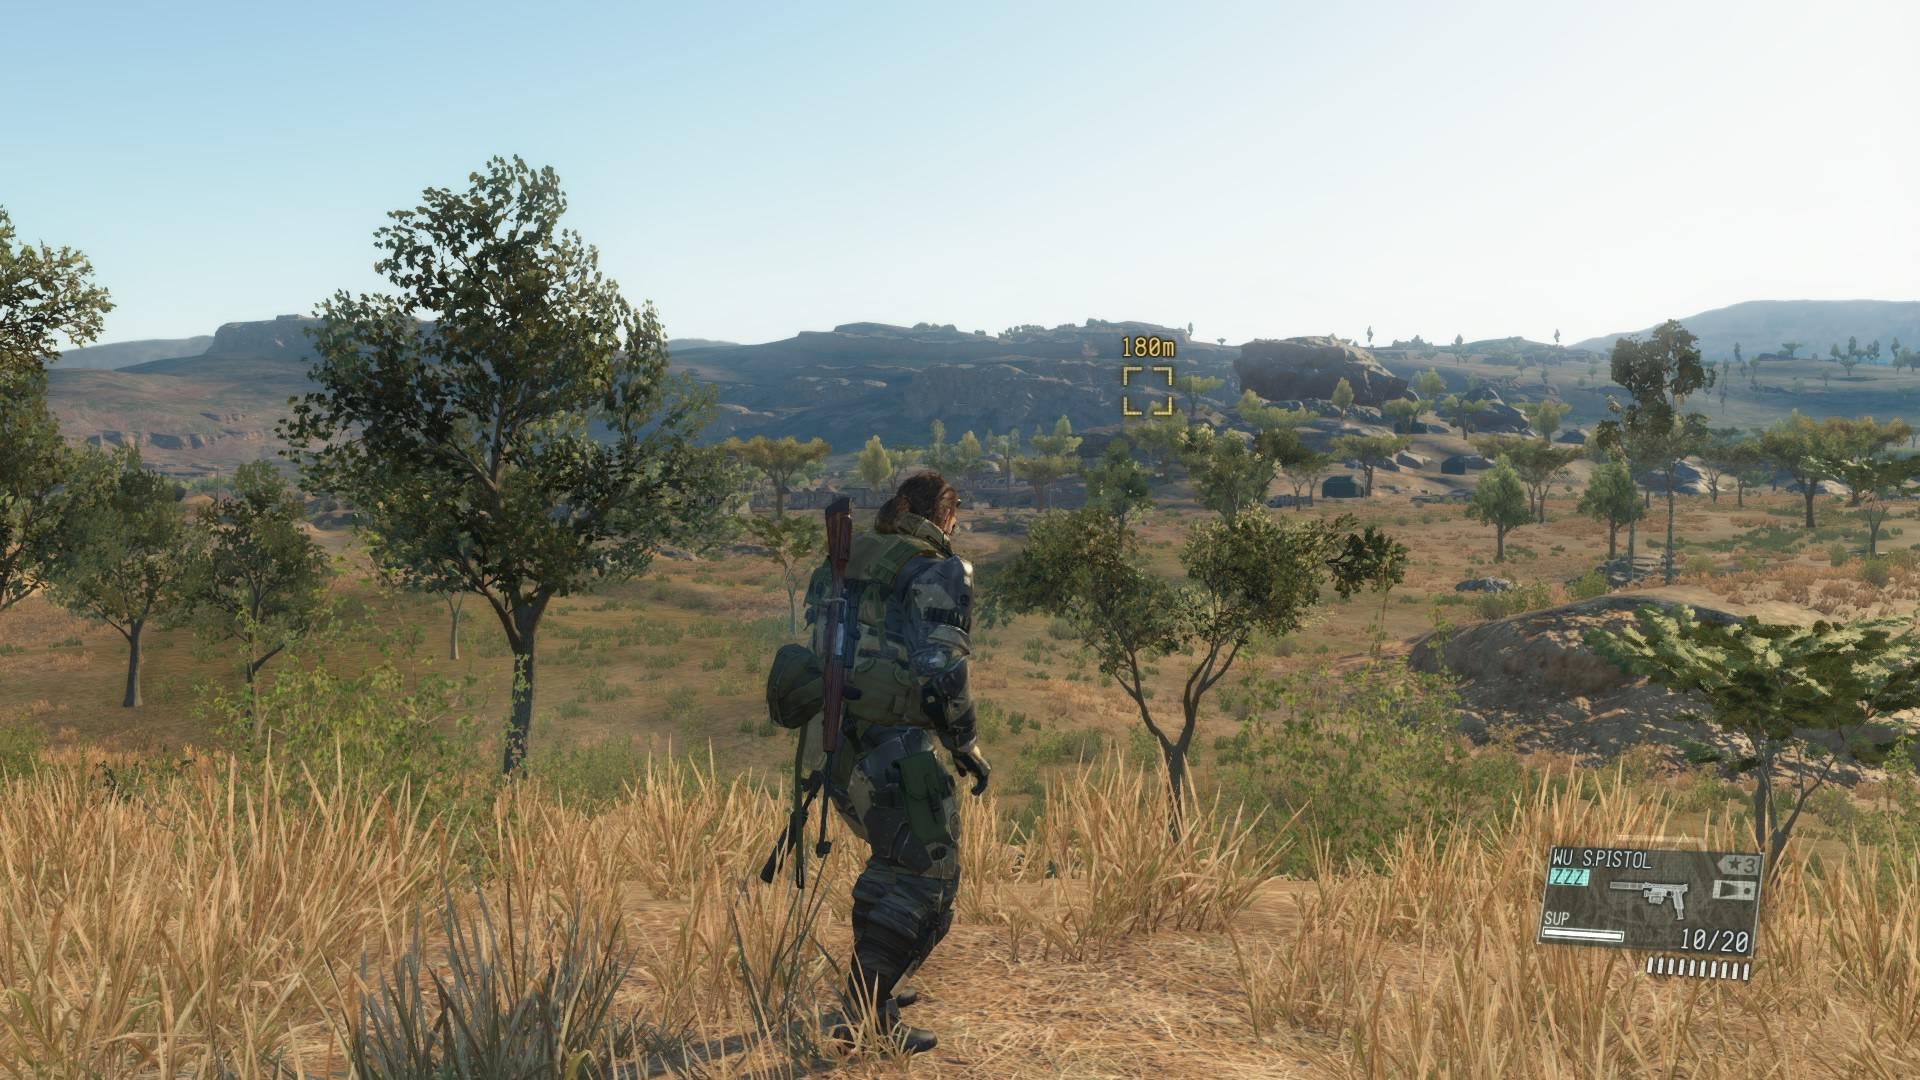 Metal Gear Solid 5: The Phantom Pain Episode 15 - Footprints